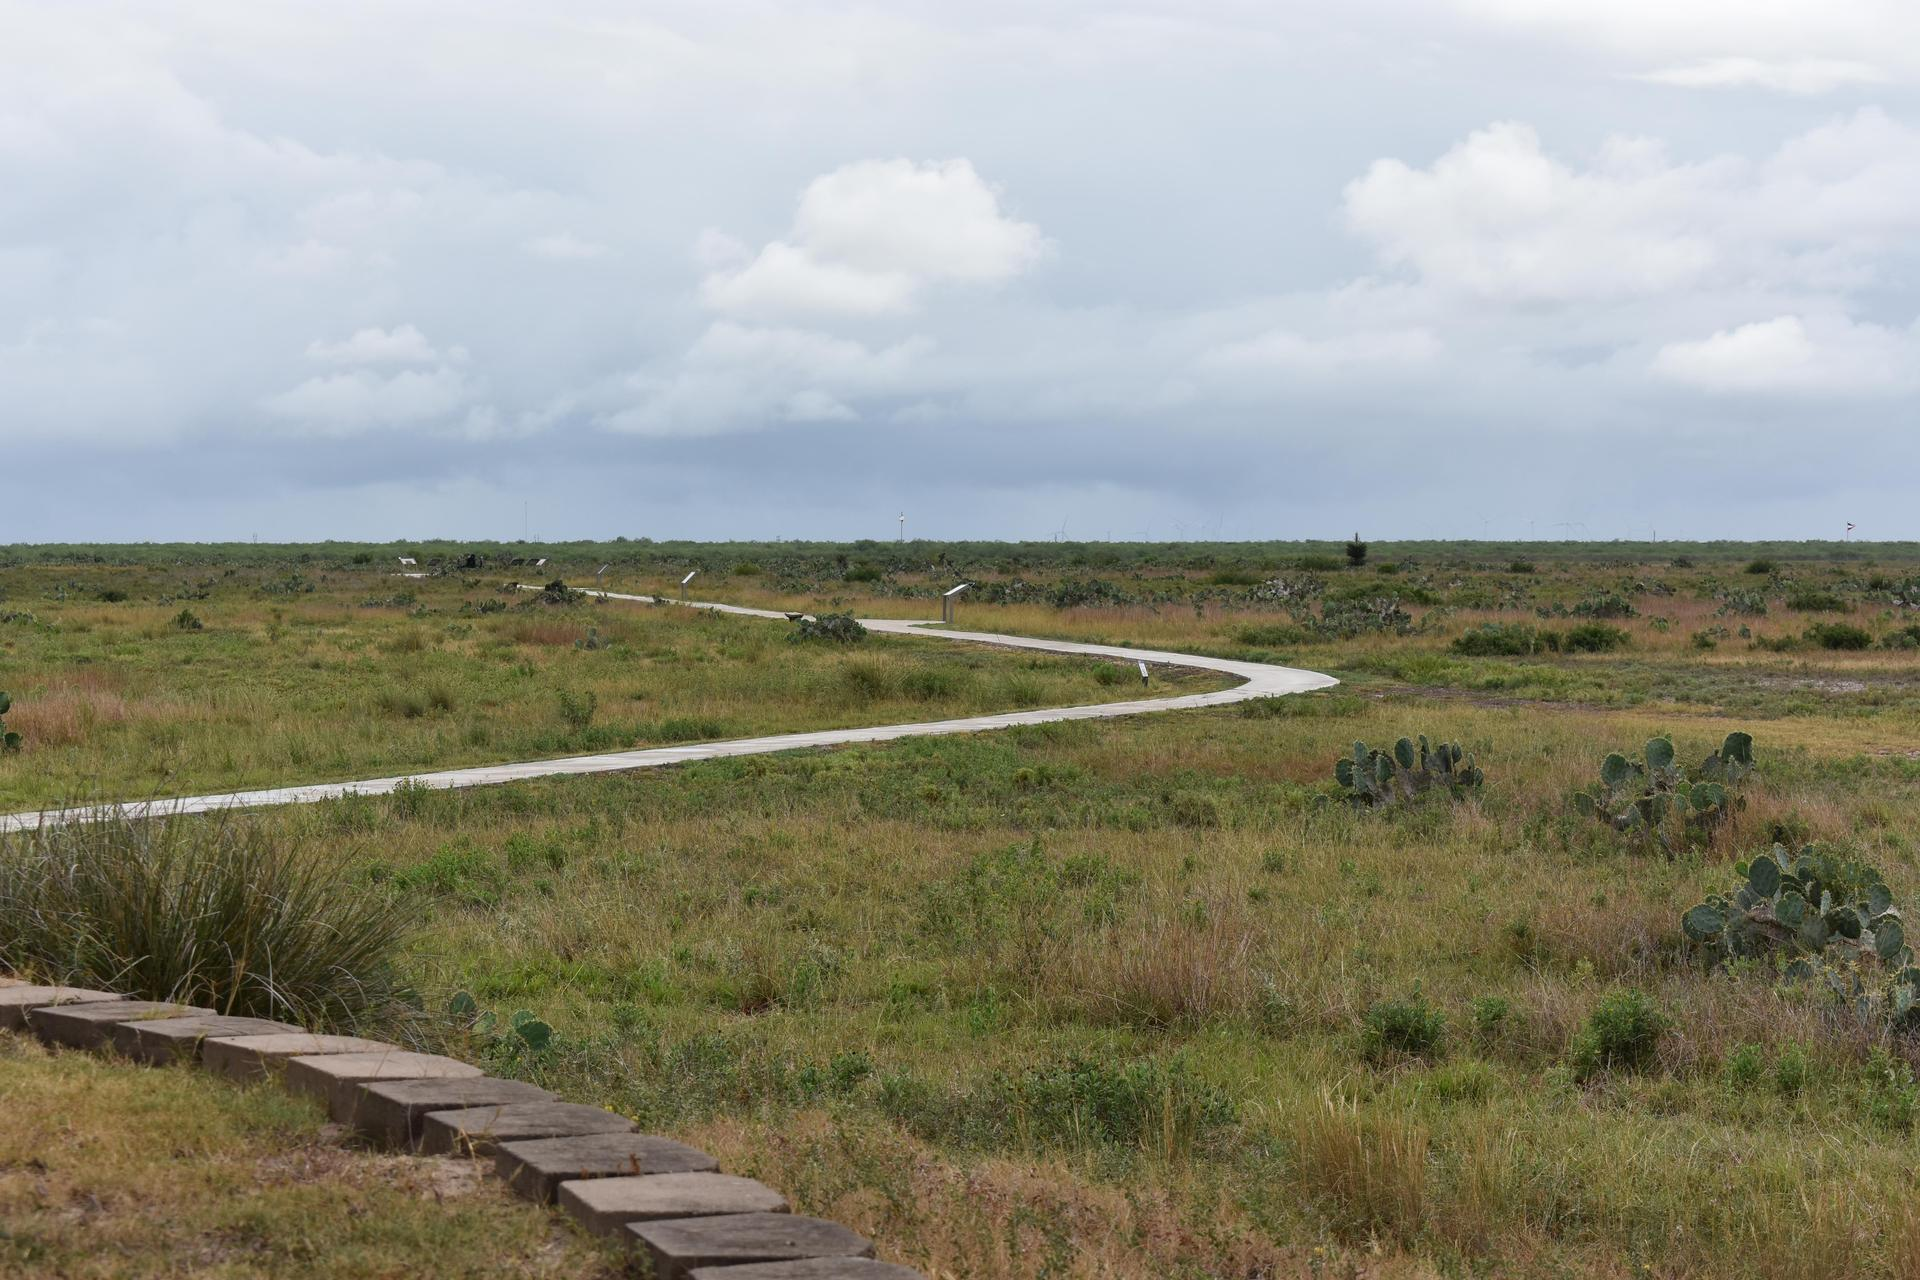 Trail going through flat grassland